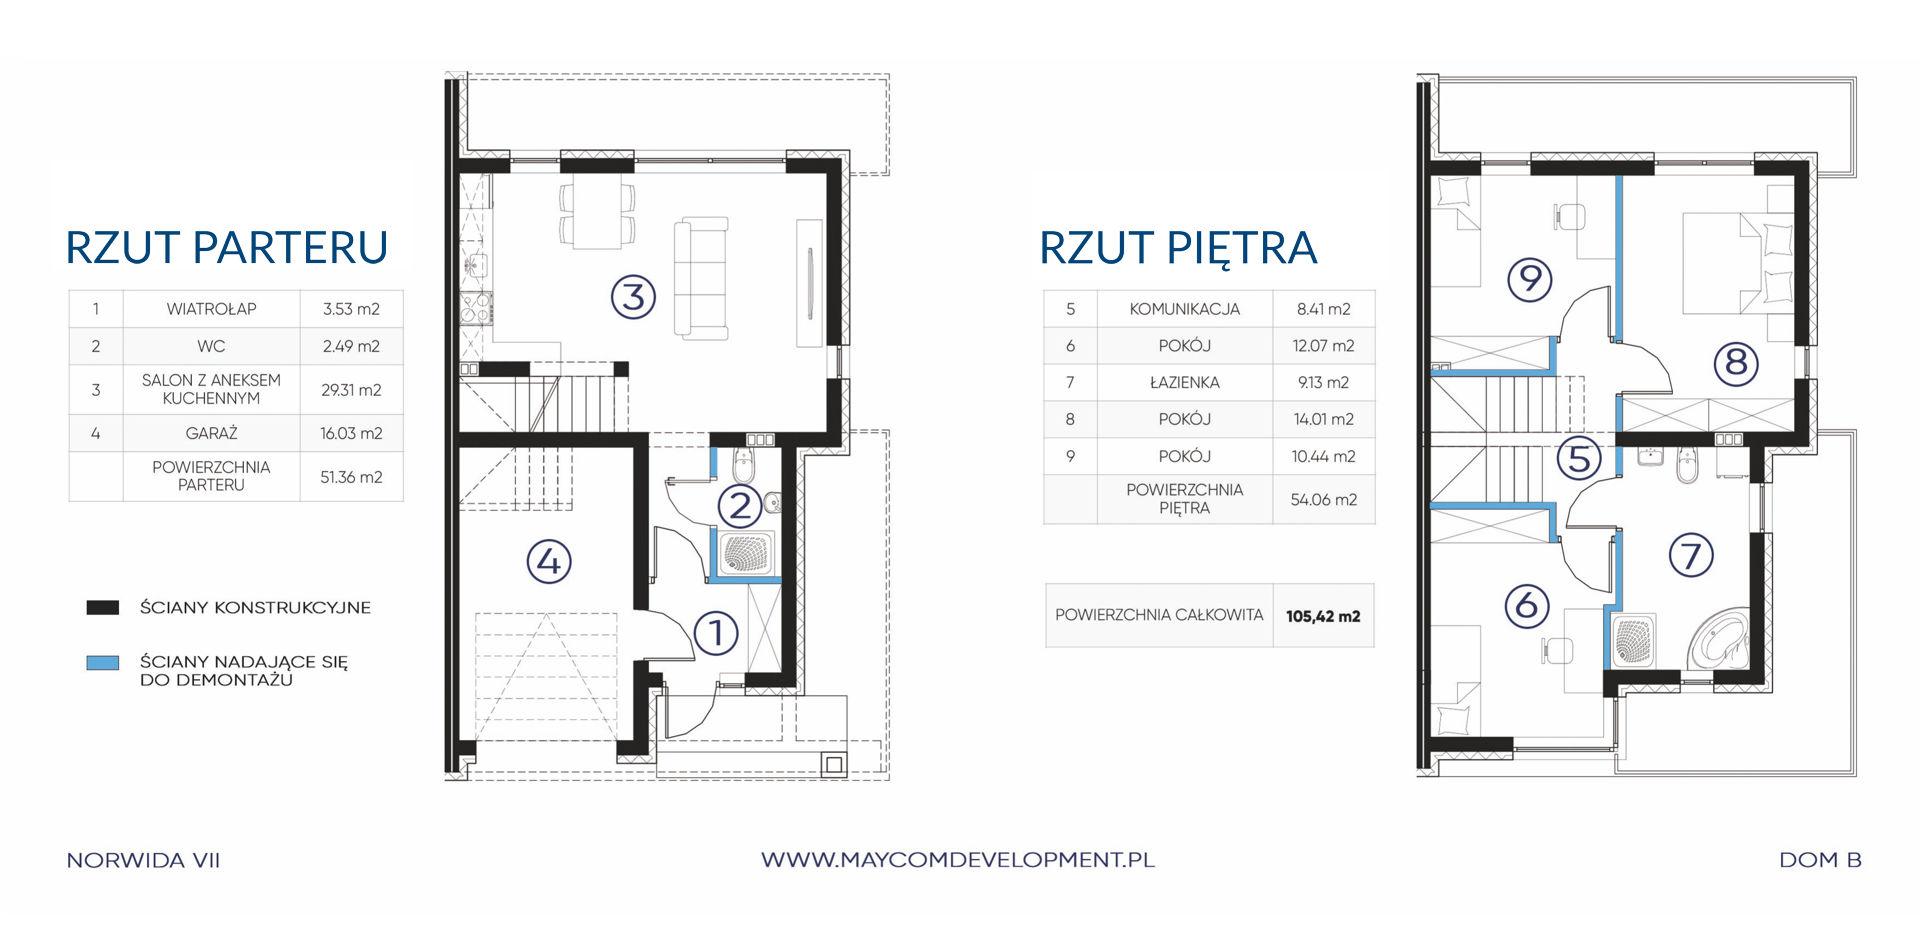 Dom B parter i piętro - NORWIDA VII